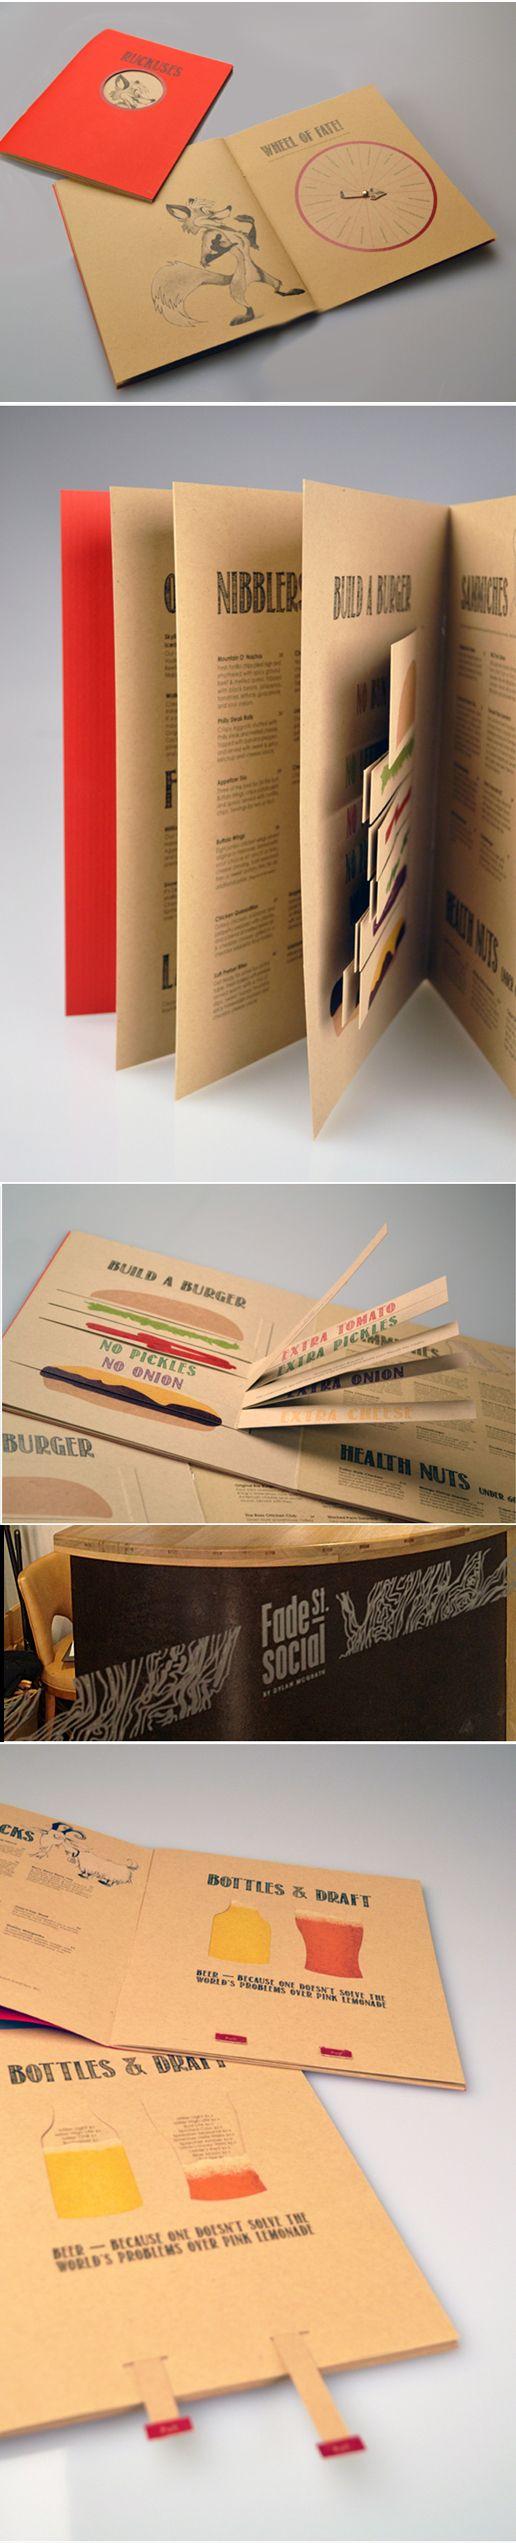 Art of the Menu – 10 of the Most Inspiring Menu & Restaurant Brandings   NextDayFlyers.com Blog